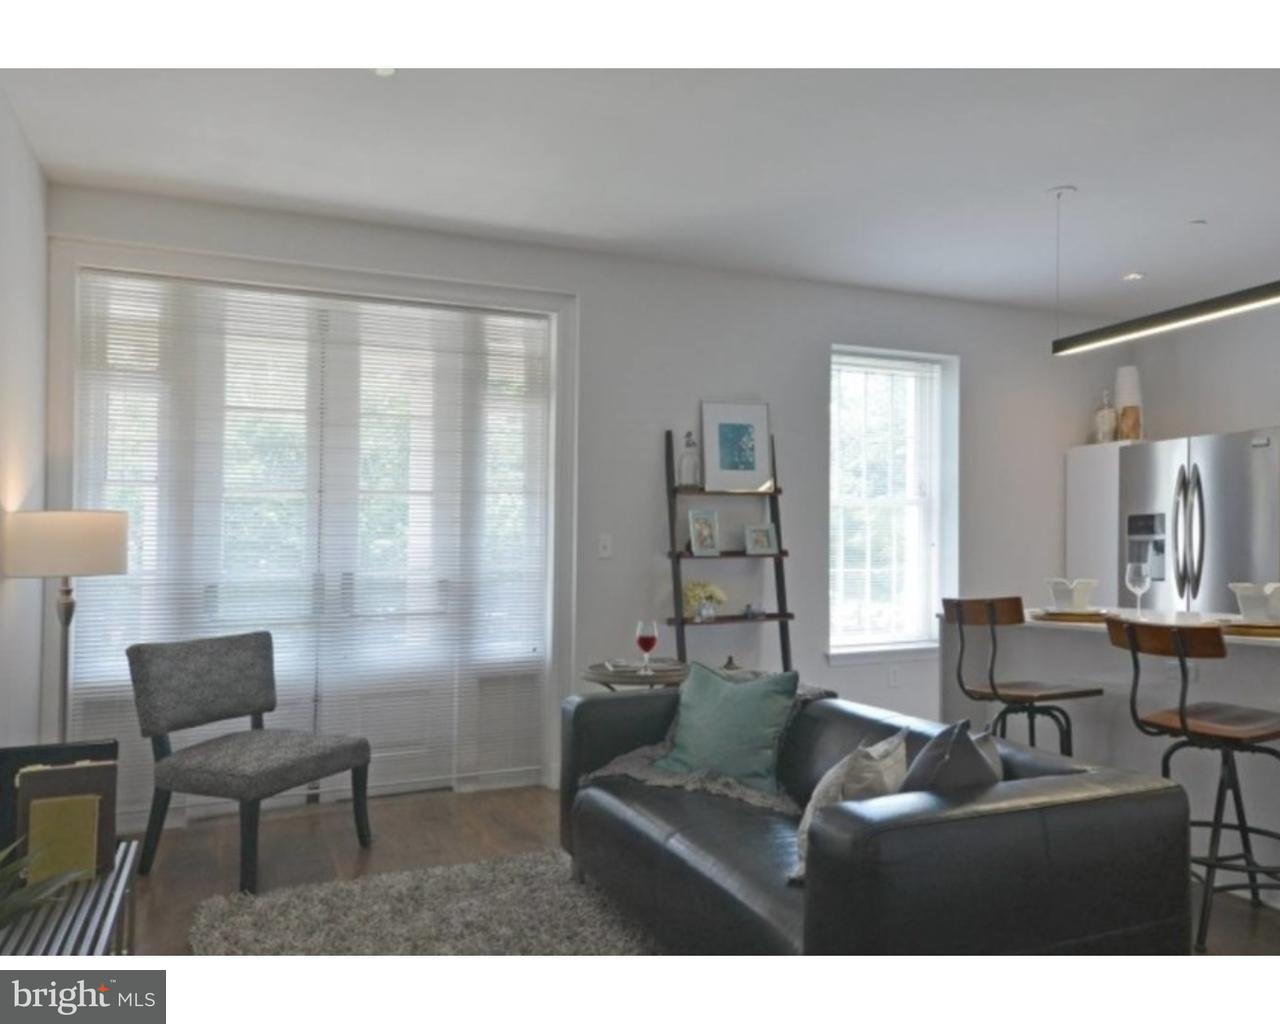 18 E Lancaster Avenue #1 BED Wynnewood , PA 19096